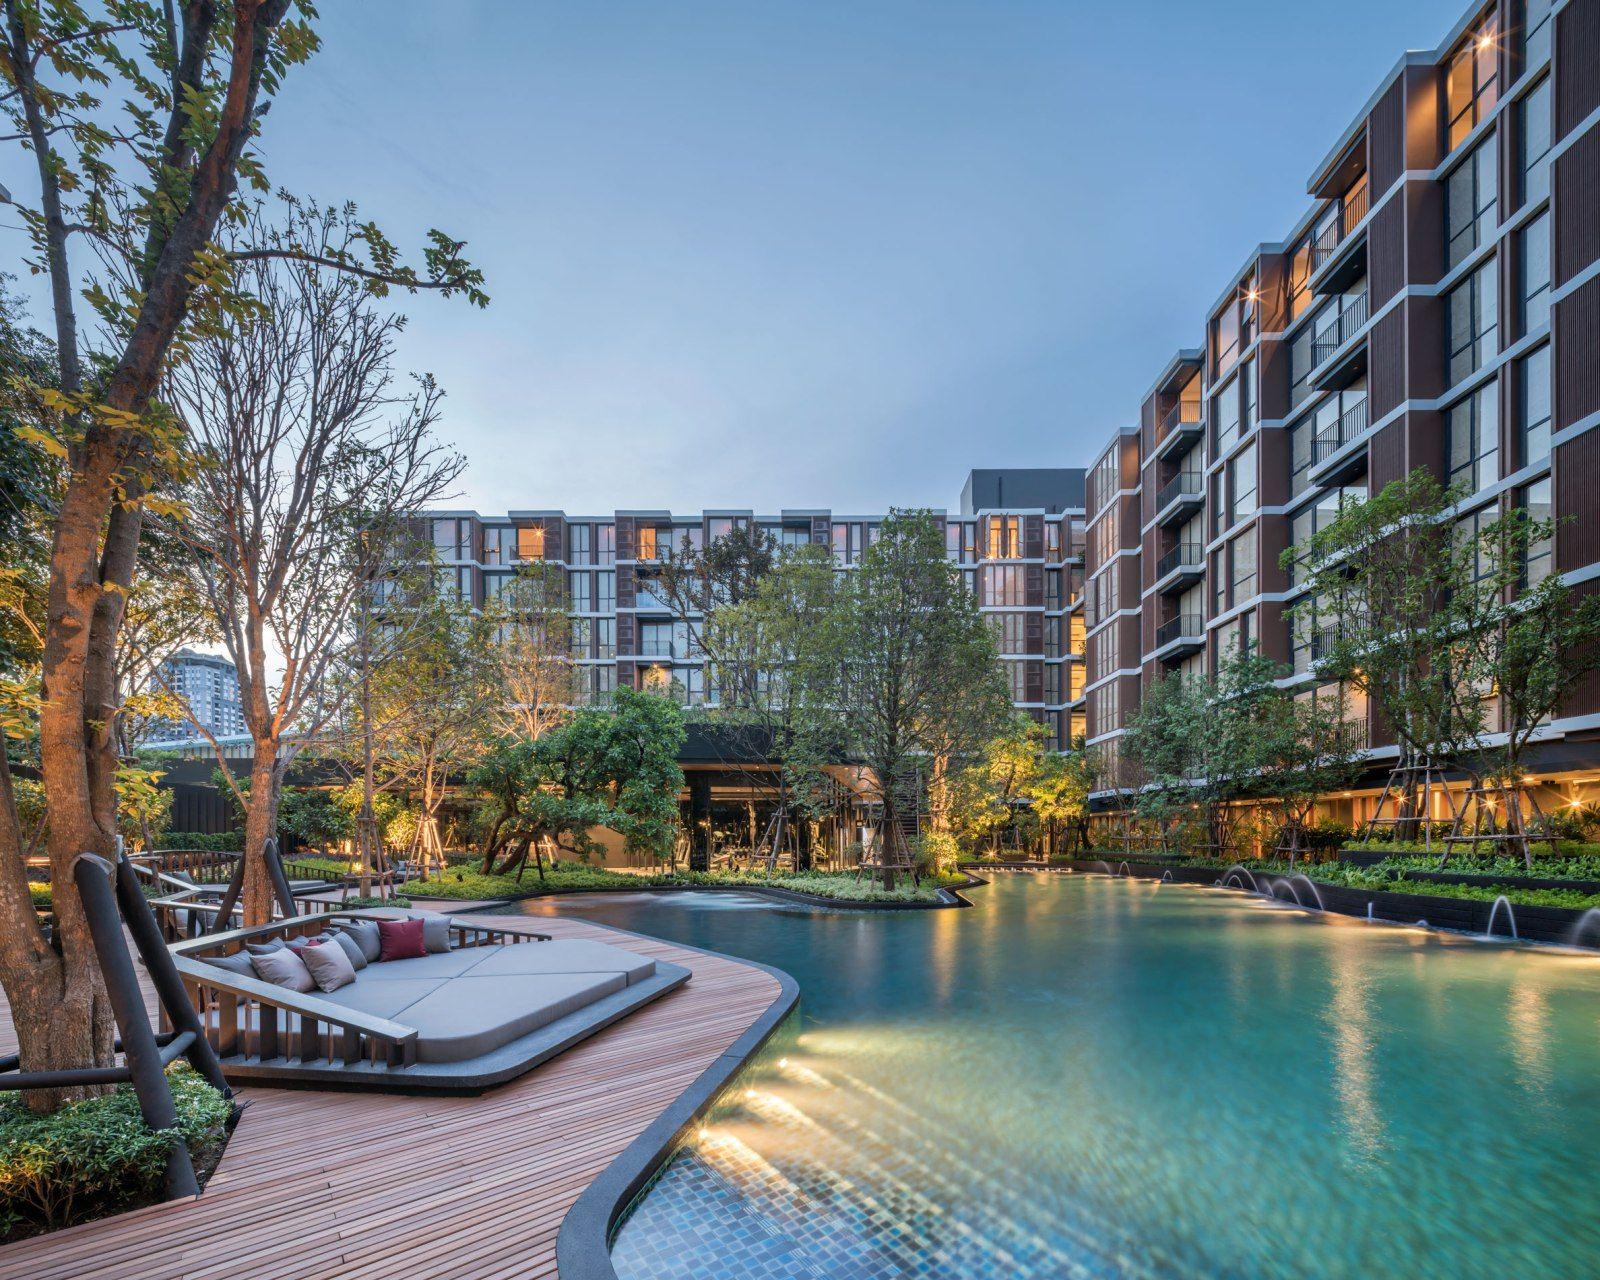 Mori Haus Condominium By Sansiri Hotel Landscape Condominium Architecture Condominium